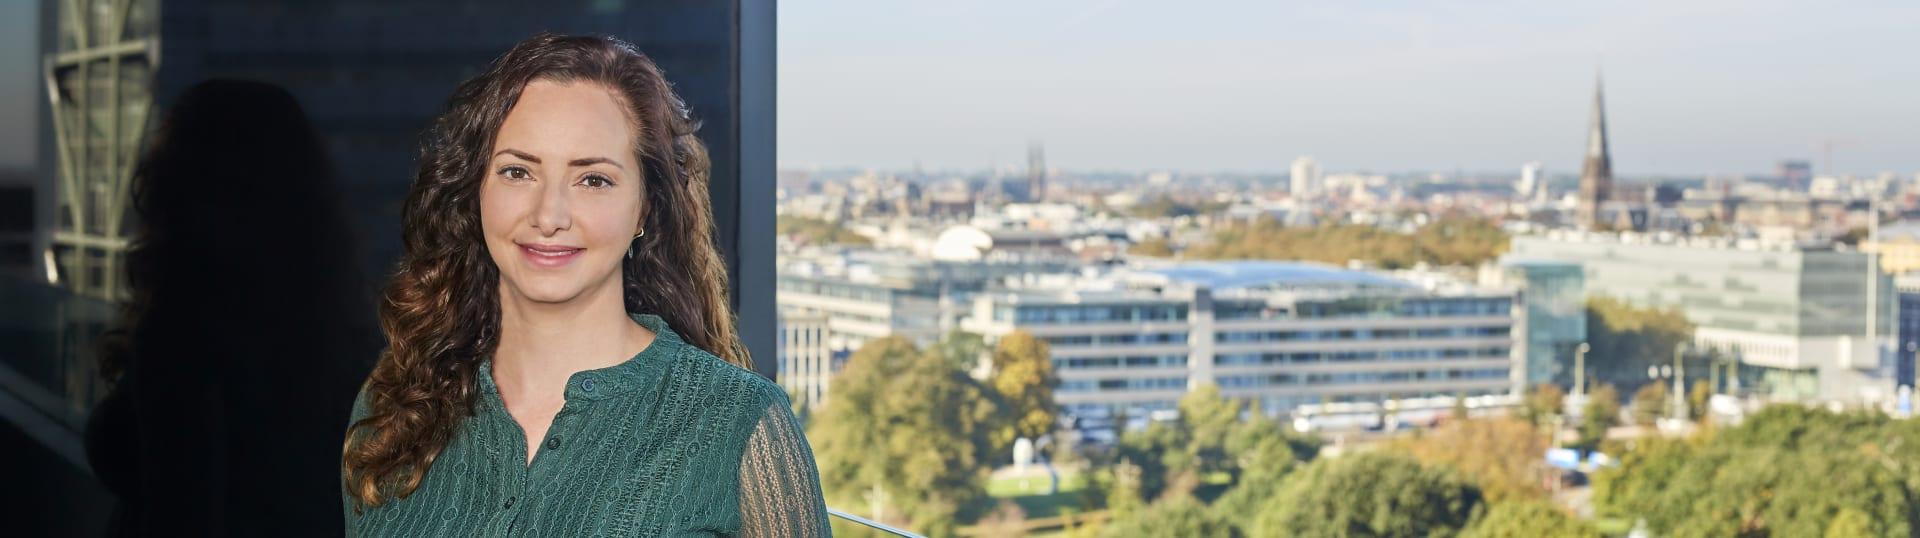 Marije van Mannekes, PSL Pels Rijcken